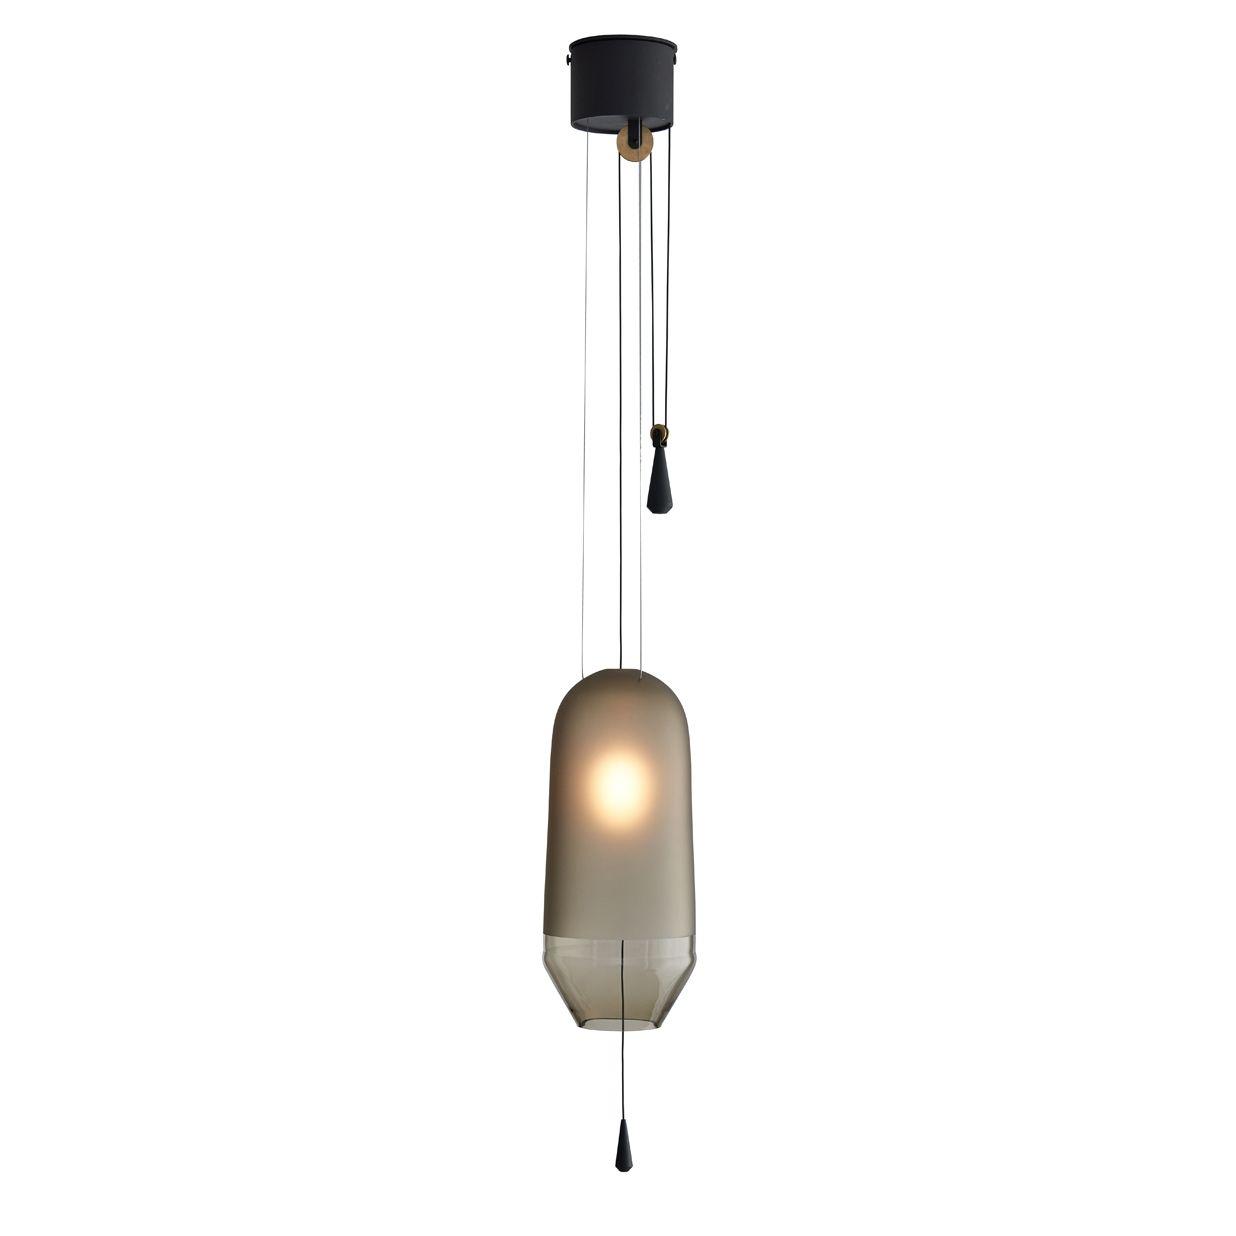 Limpid hanglamp S Hollands Licht gerookt verstelbaar